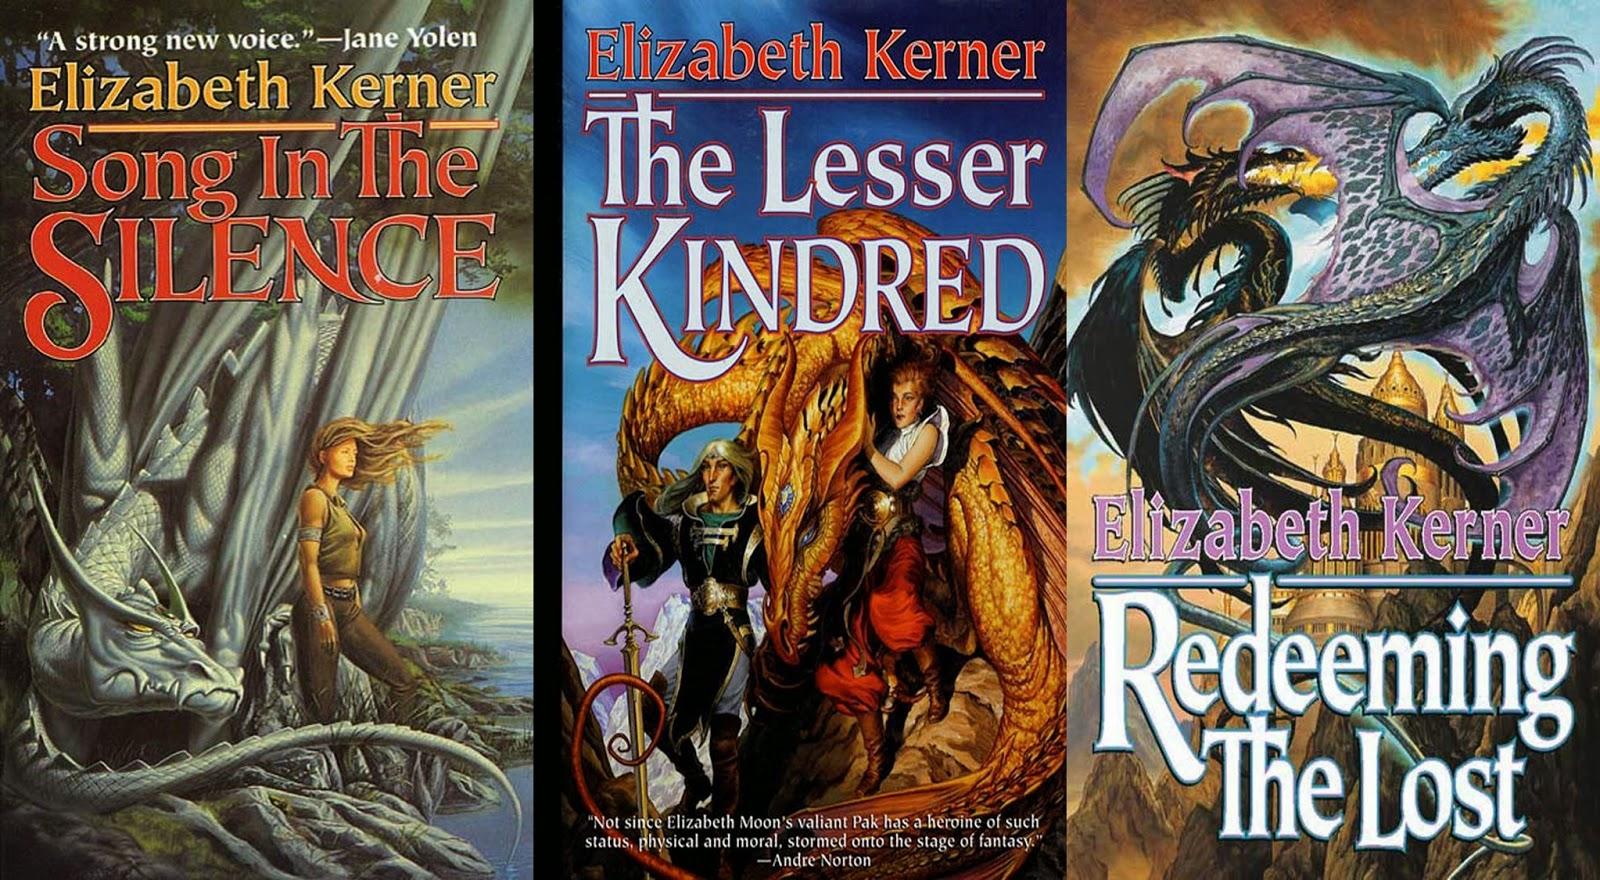 Tales of Kolmar by  Elizabeth Kerner | Epic Fantasy | Series Summary